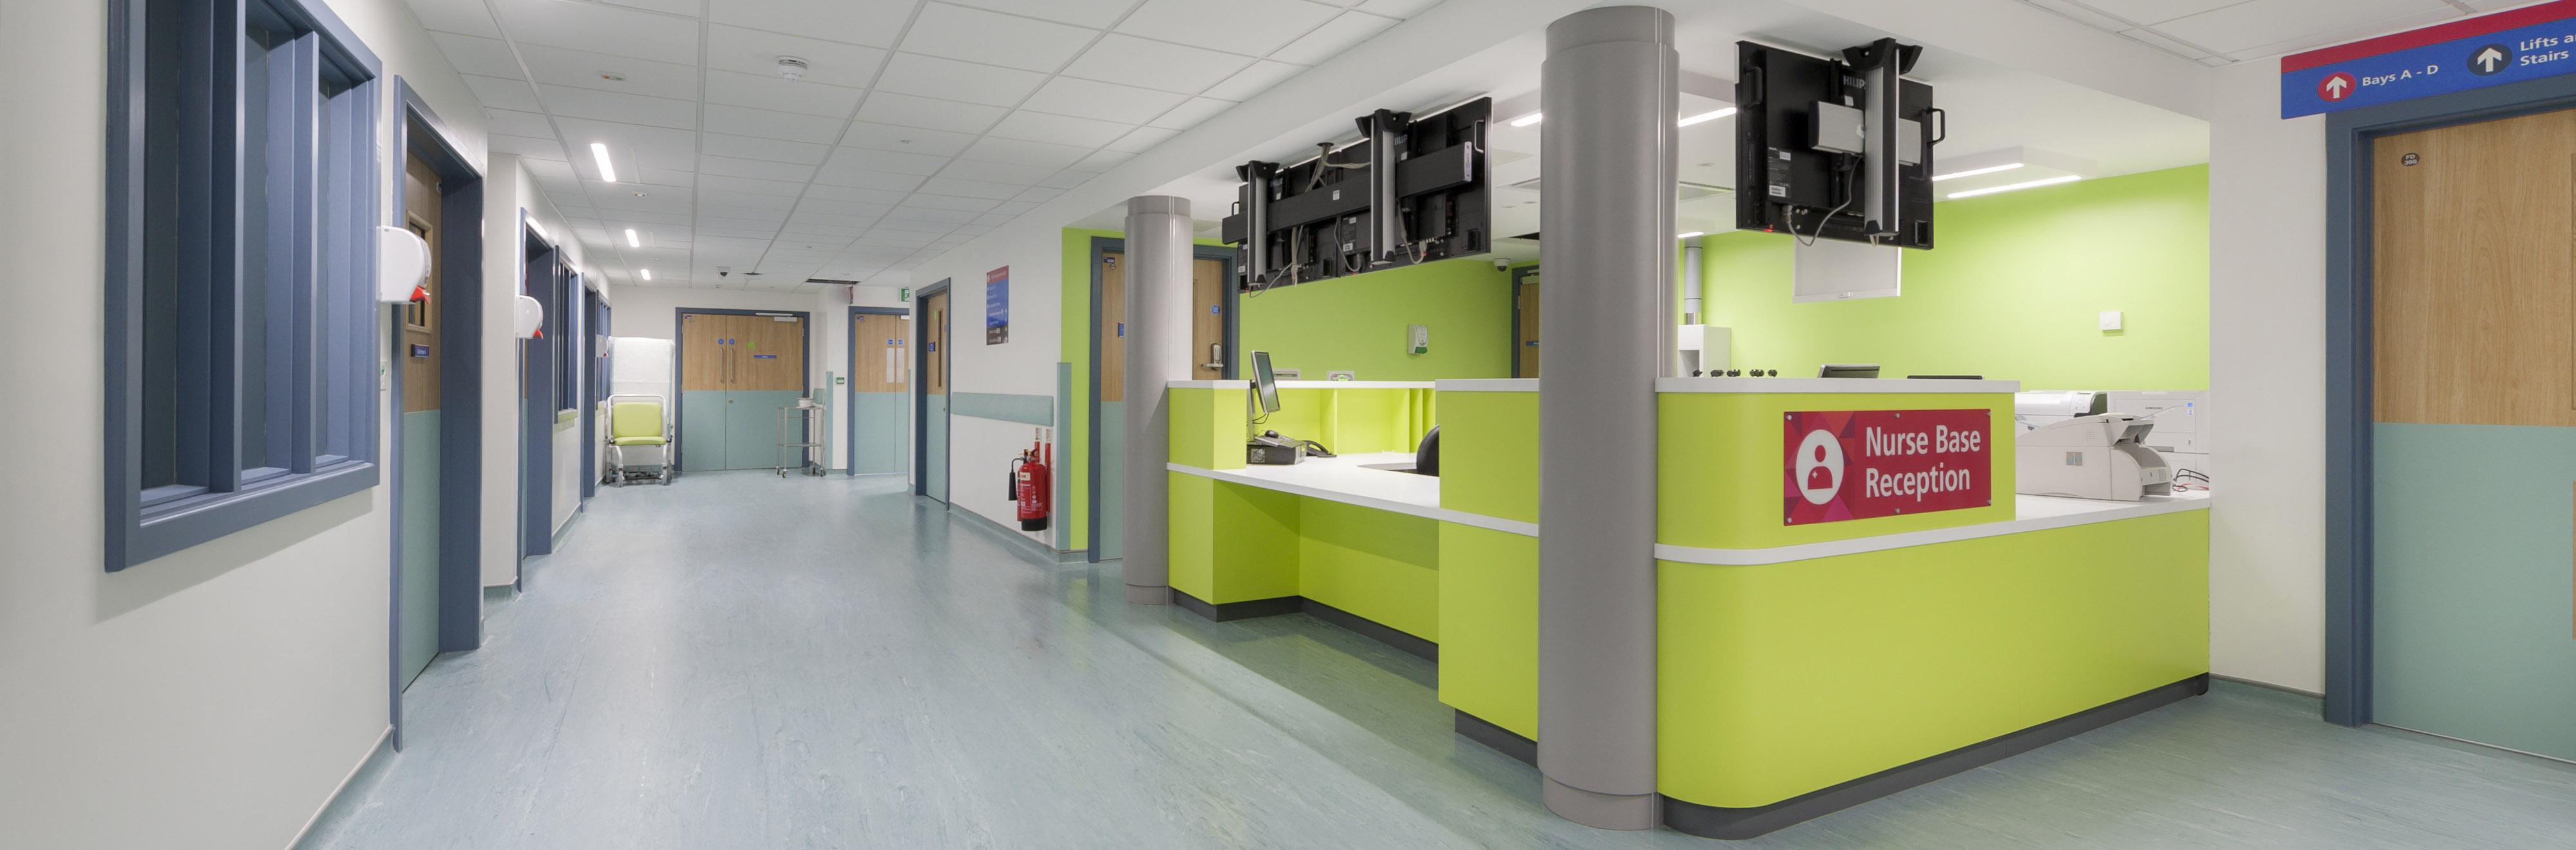 Northwick-Park-Hospital_banner